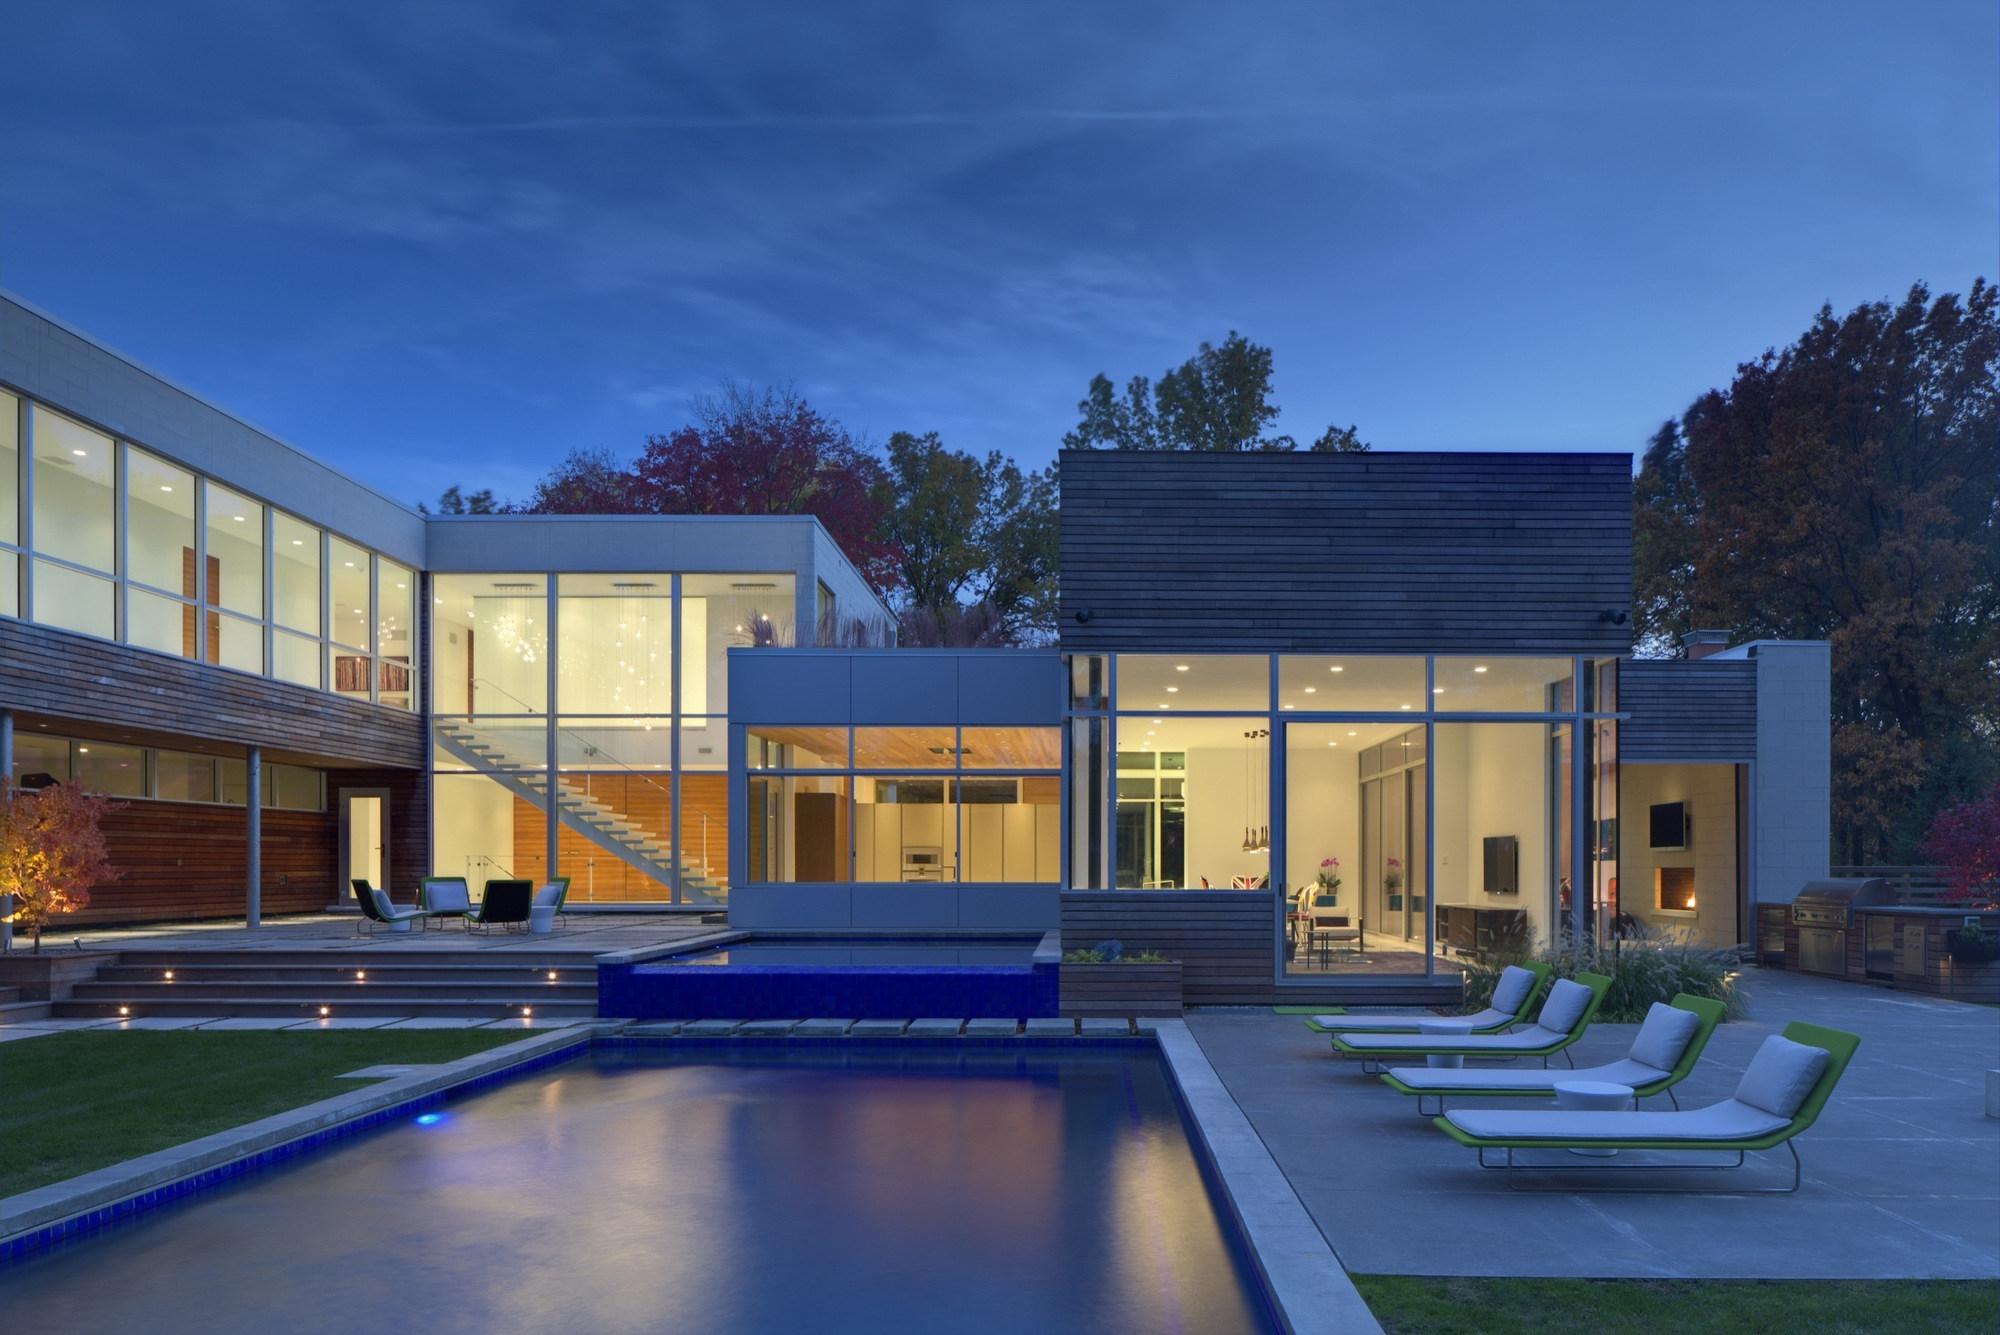 Shaker Heights House By Dimit Architects KARMATRENDZ